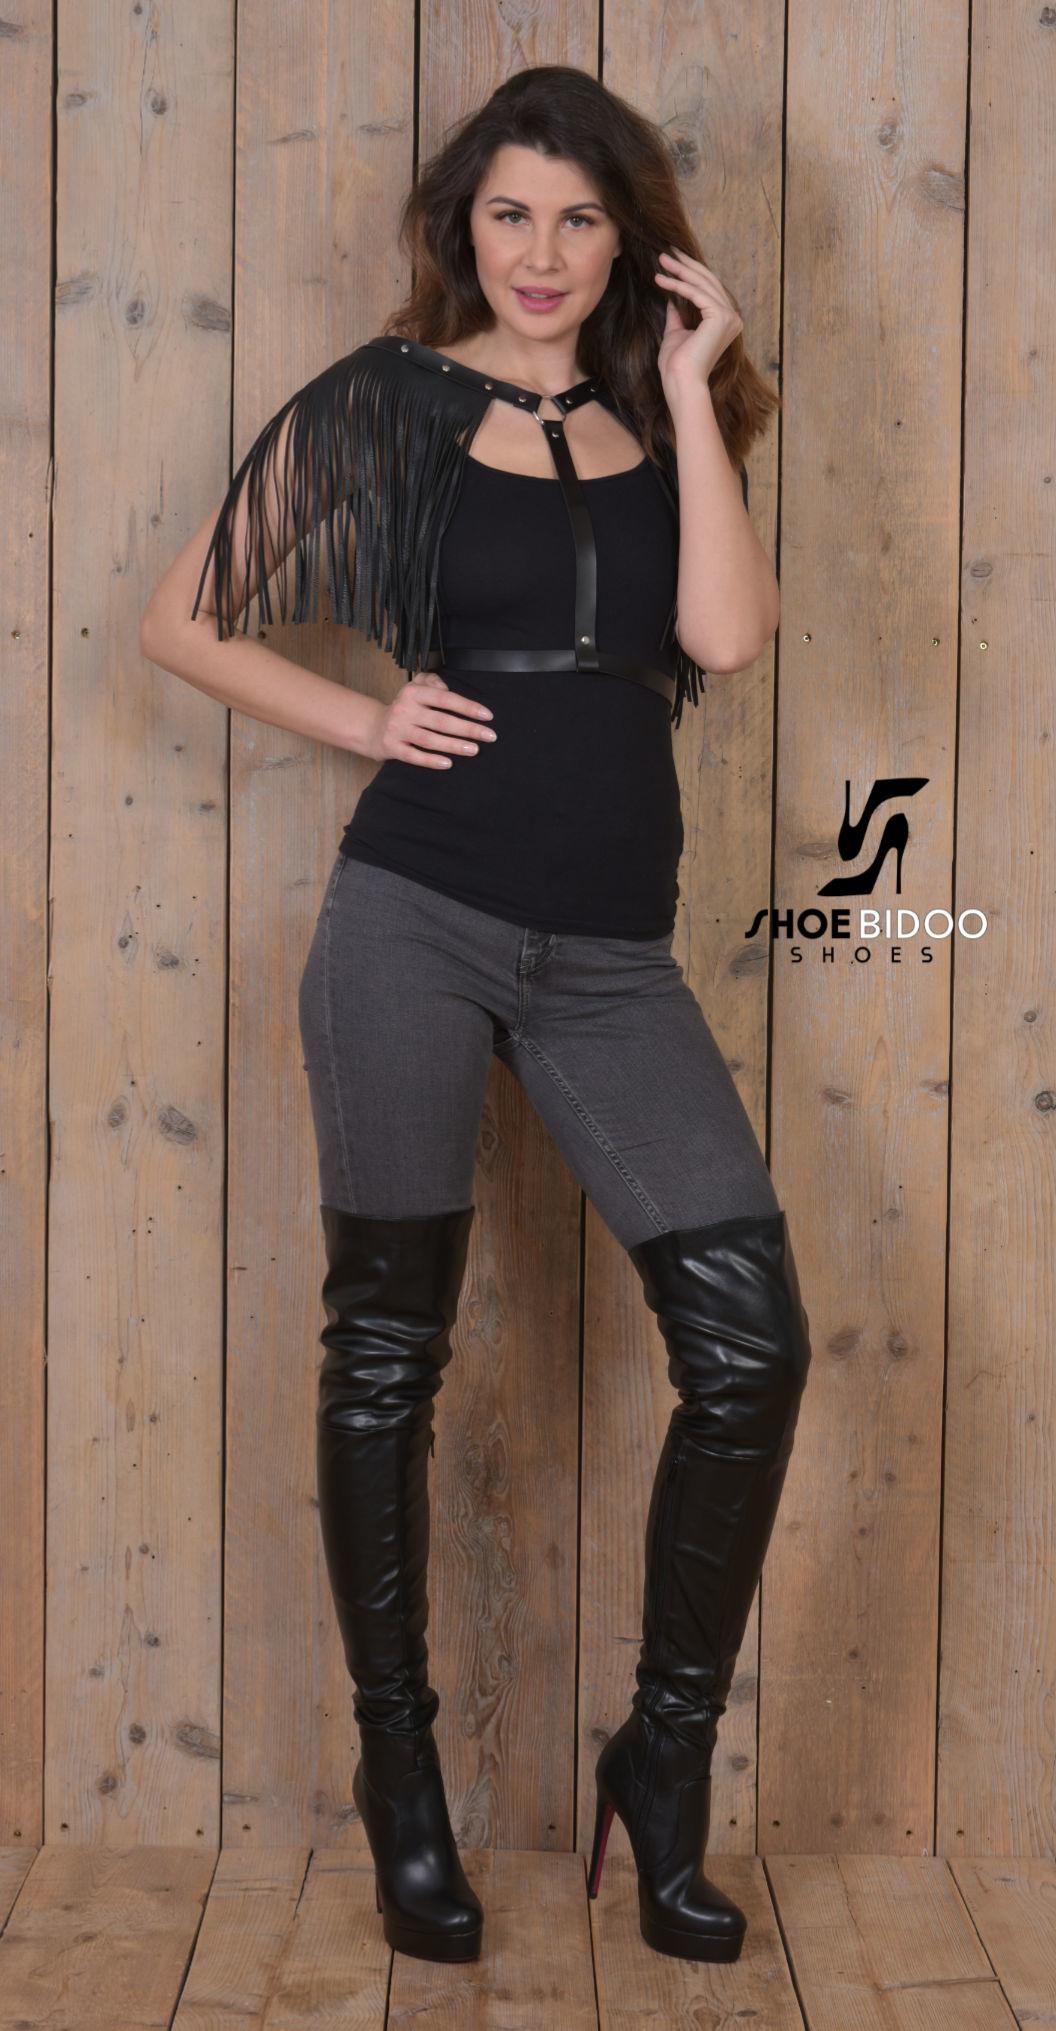 Olga in jeans en dij hoge laarzen